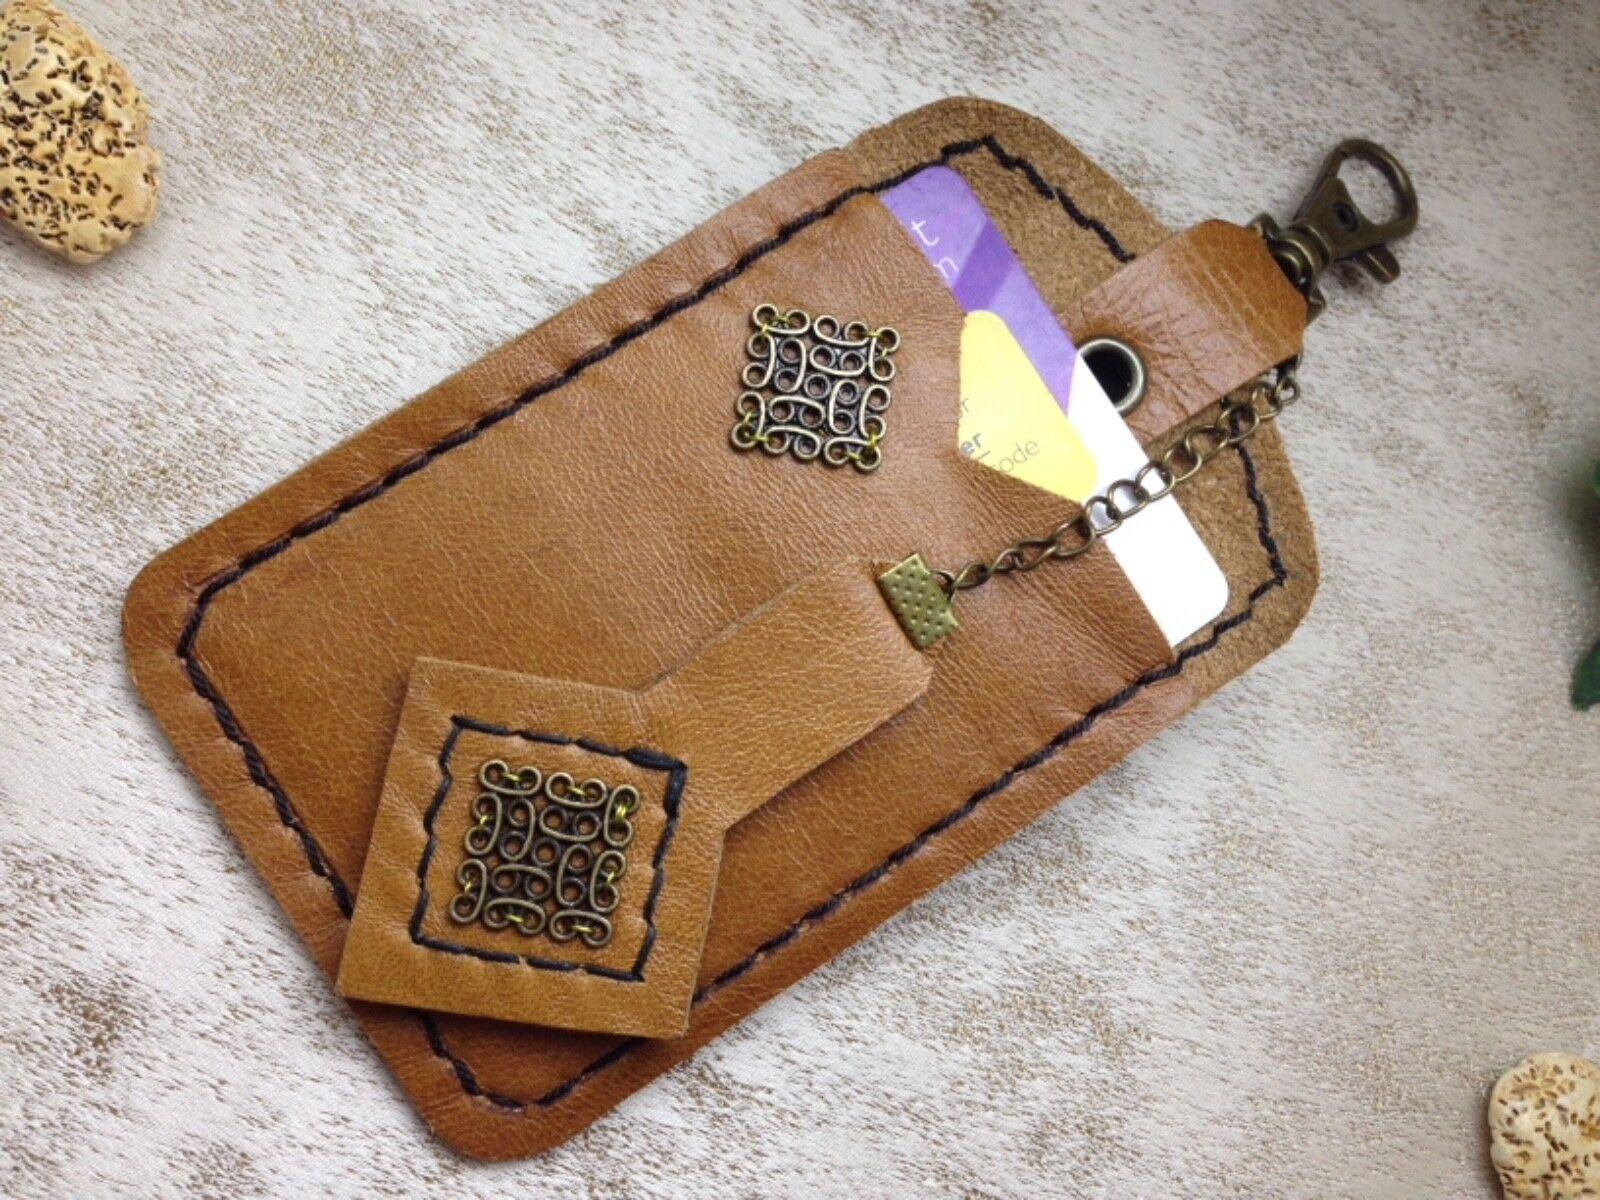 Handmade Leather ID Card Holder Plus Matching Key Chain Steampunk Festival LARP